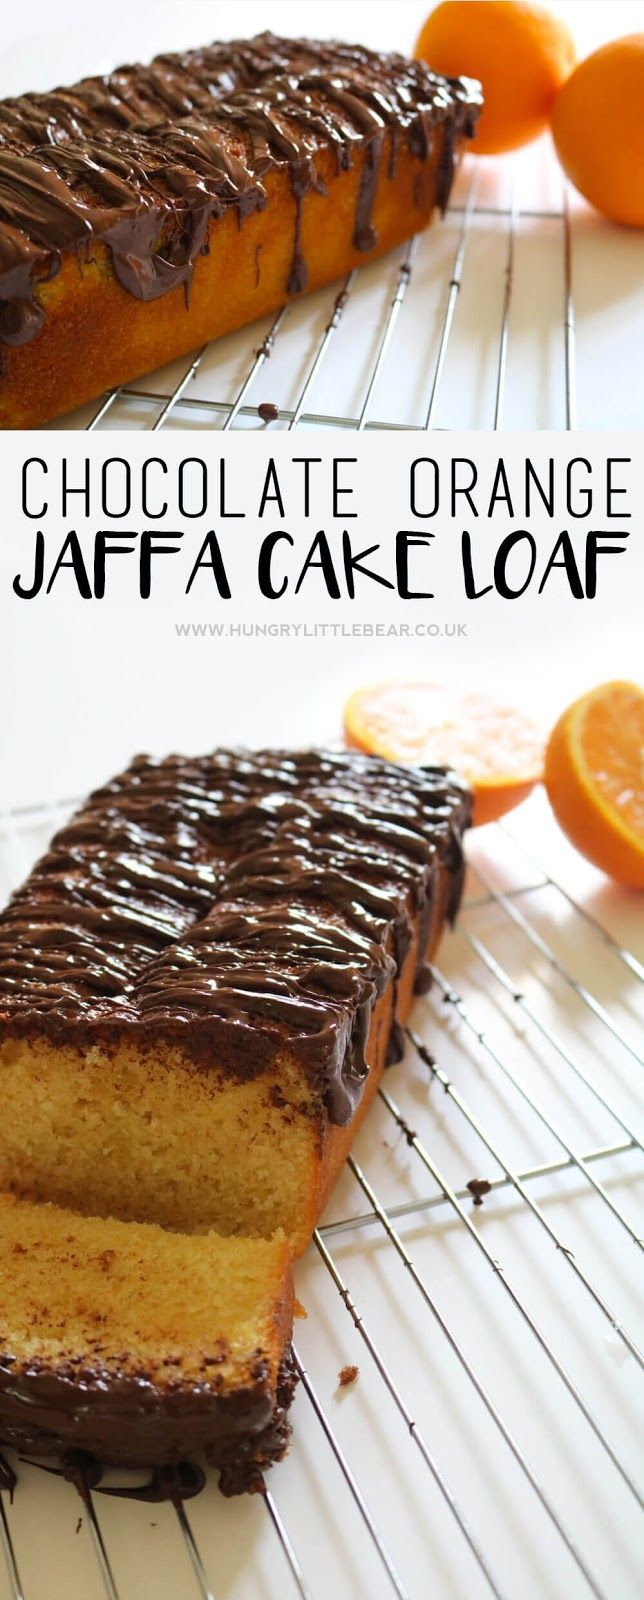 Chocolate Orange Jaffa Cake Loaf | Hungry Little Bear